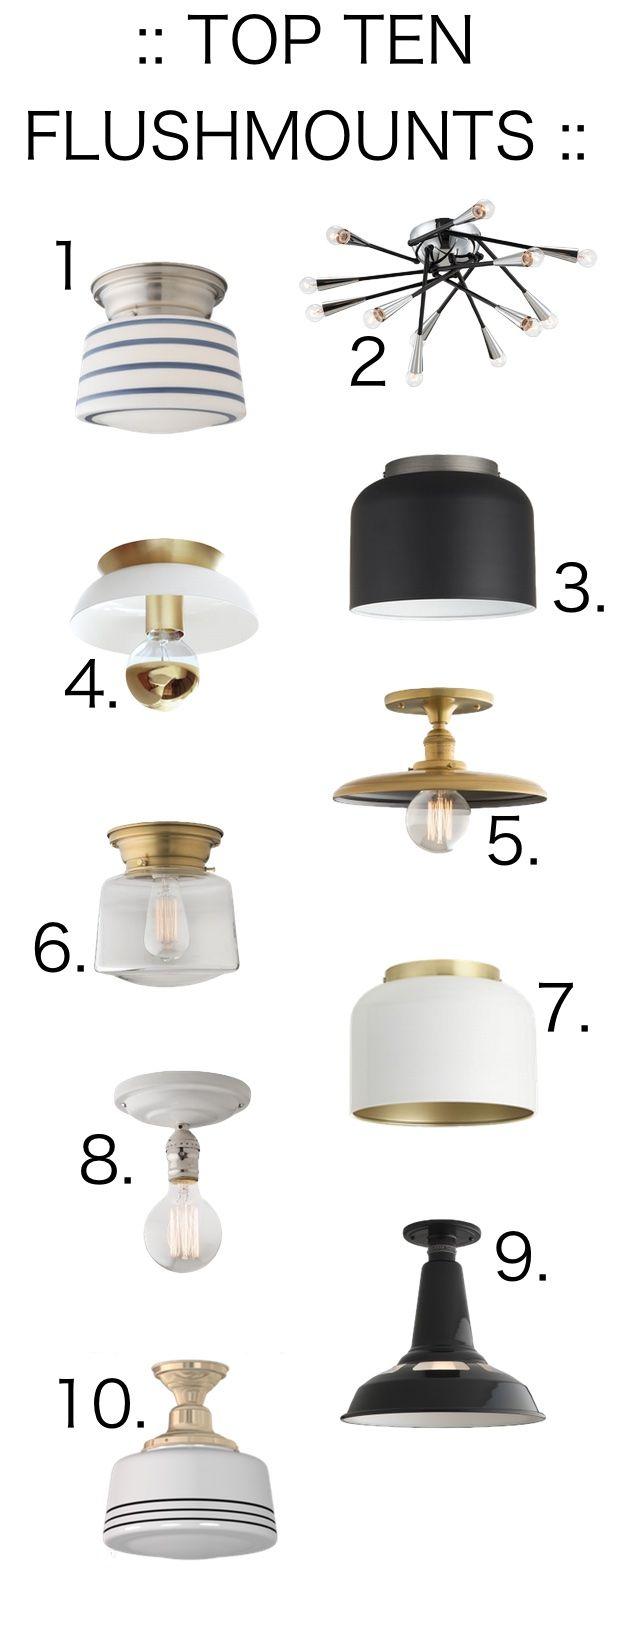 Kitchen Flush Mount Lighting 25 Best Ideas About Flush Mount Lighting On Pinterest Flush